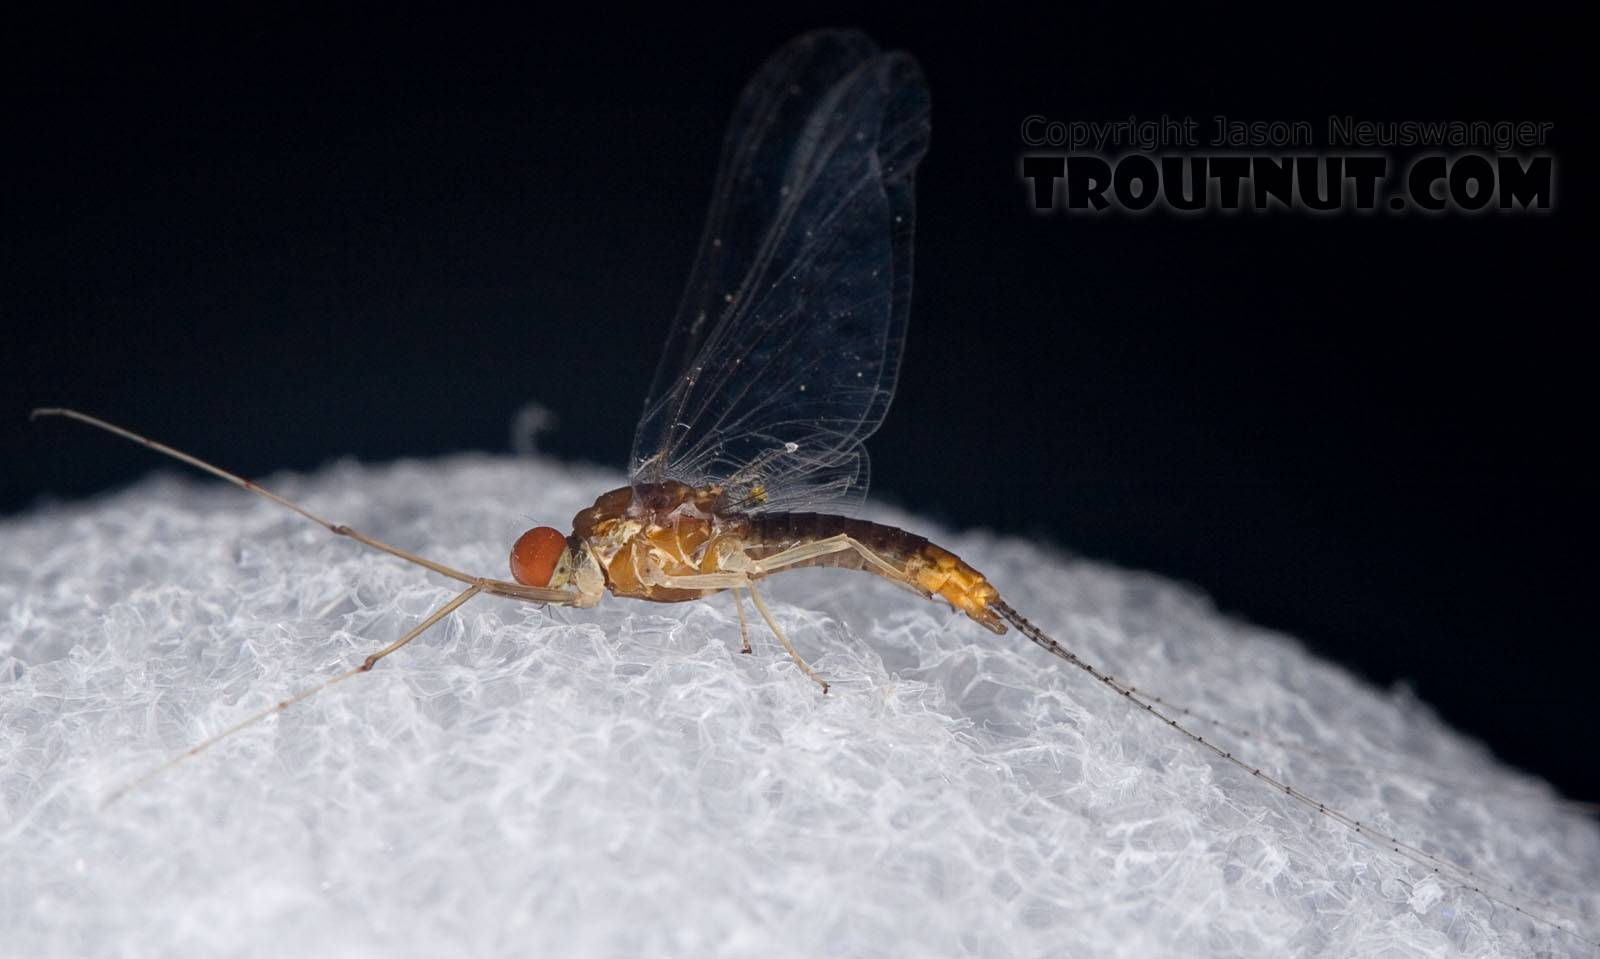 Male Ephemerella (Hendricksons, Sulphurs, PMDs) Mayfly Spinner from Penn's Creek in Pennsylvania